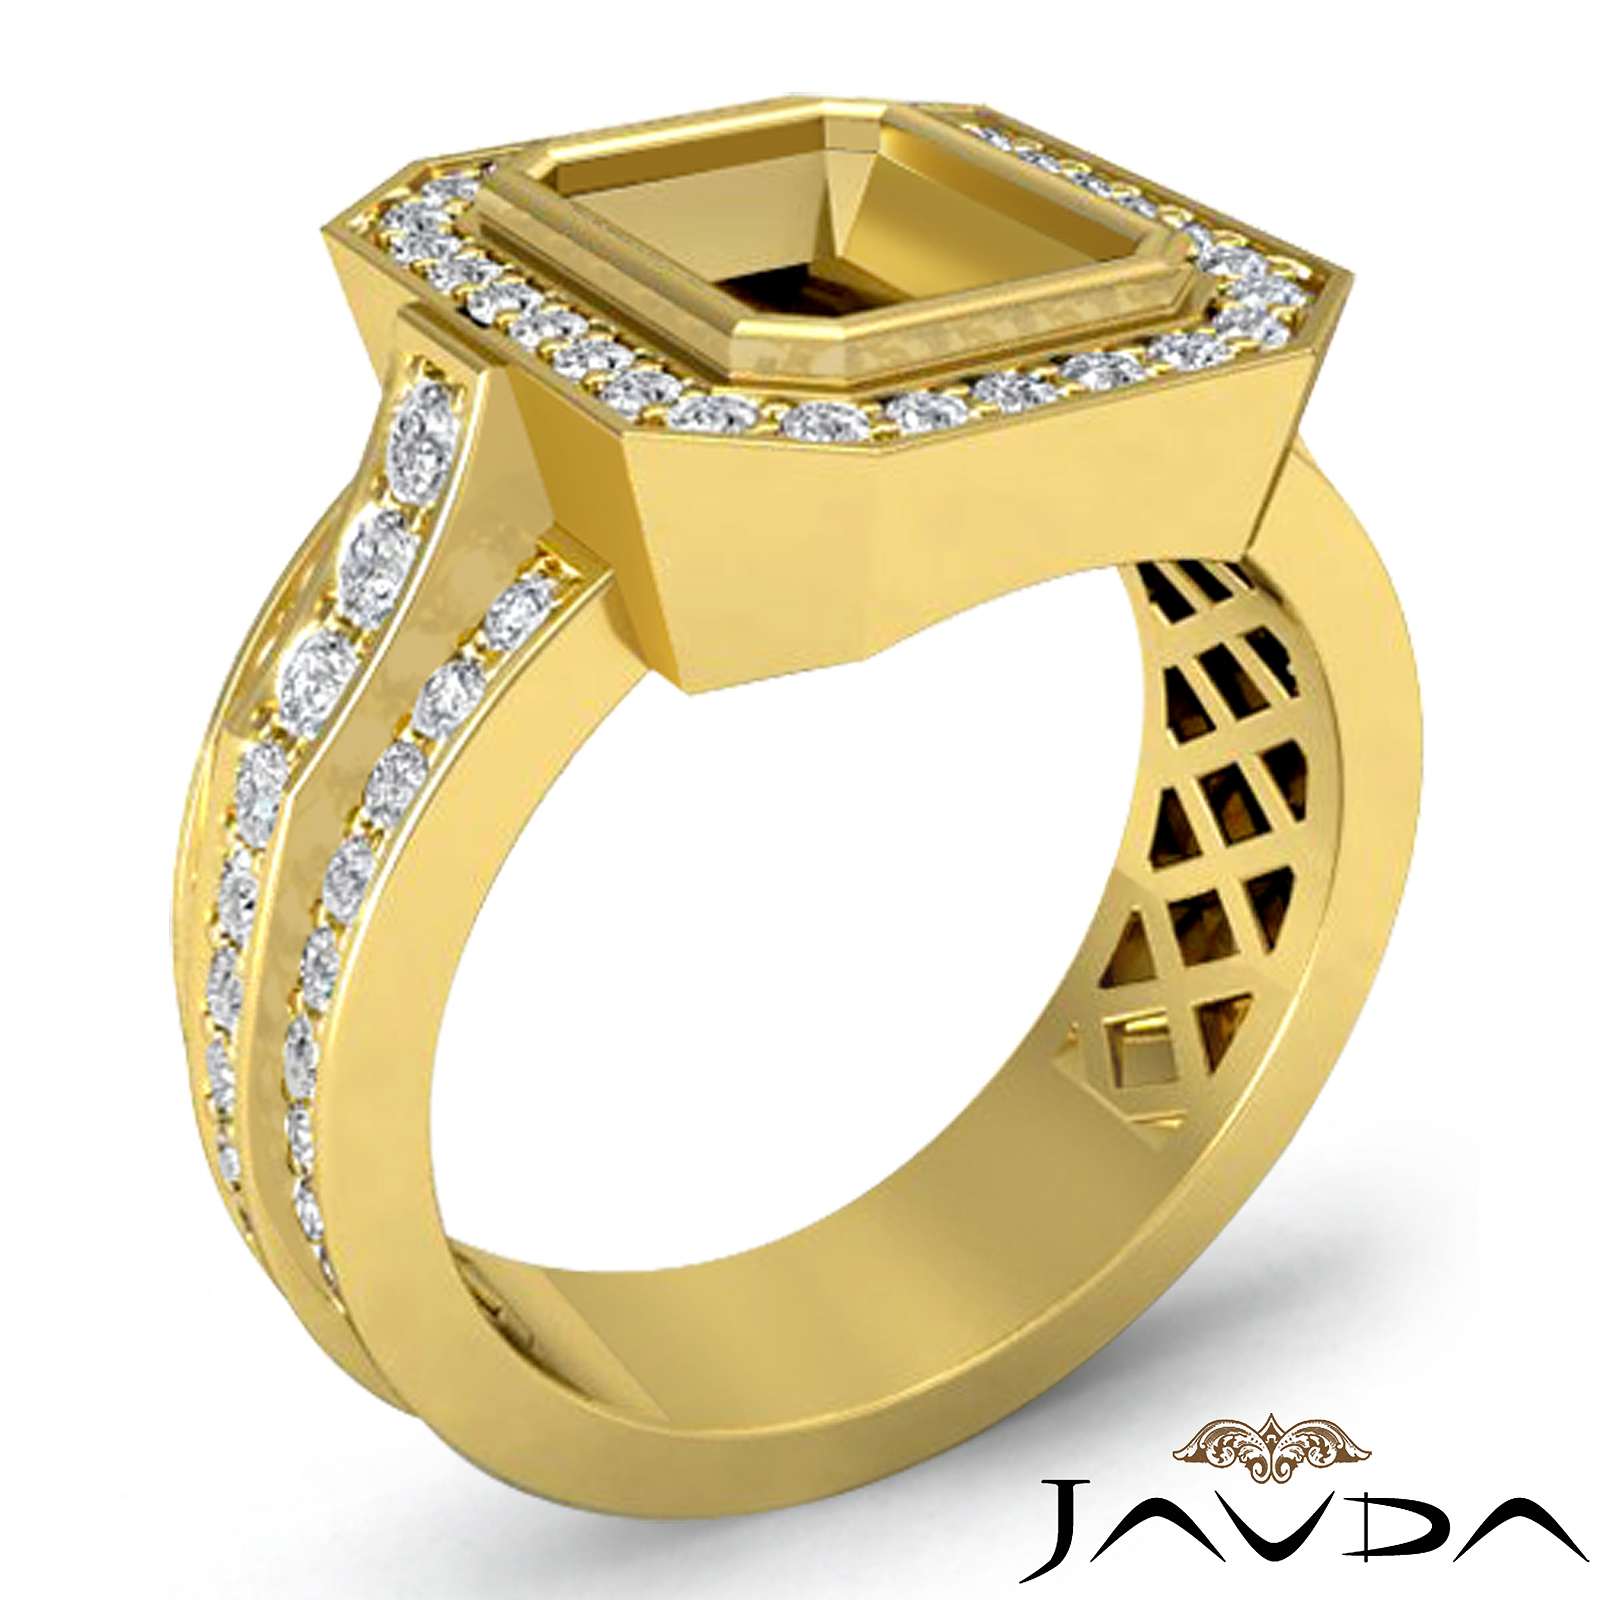 diamond anniversary ring 14k yellow gold emerald shape. Black Bedroom Furniture Sets. Home Design Ideas